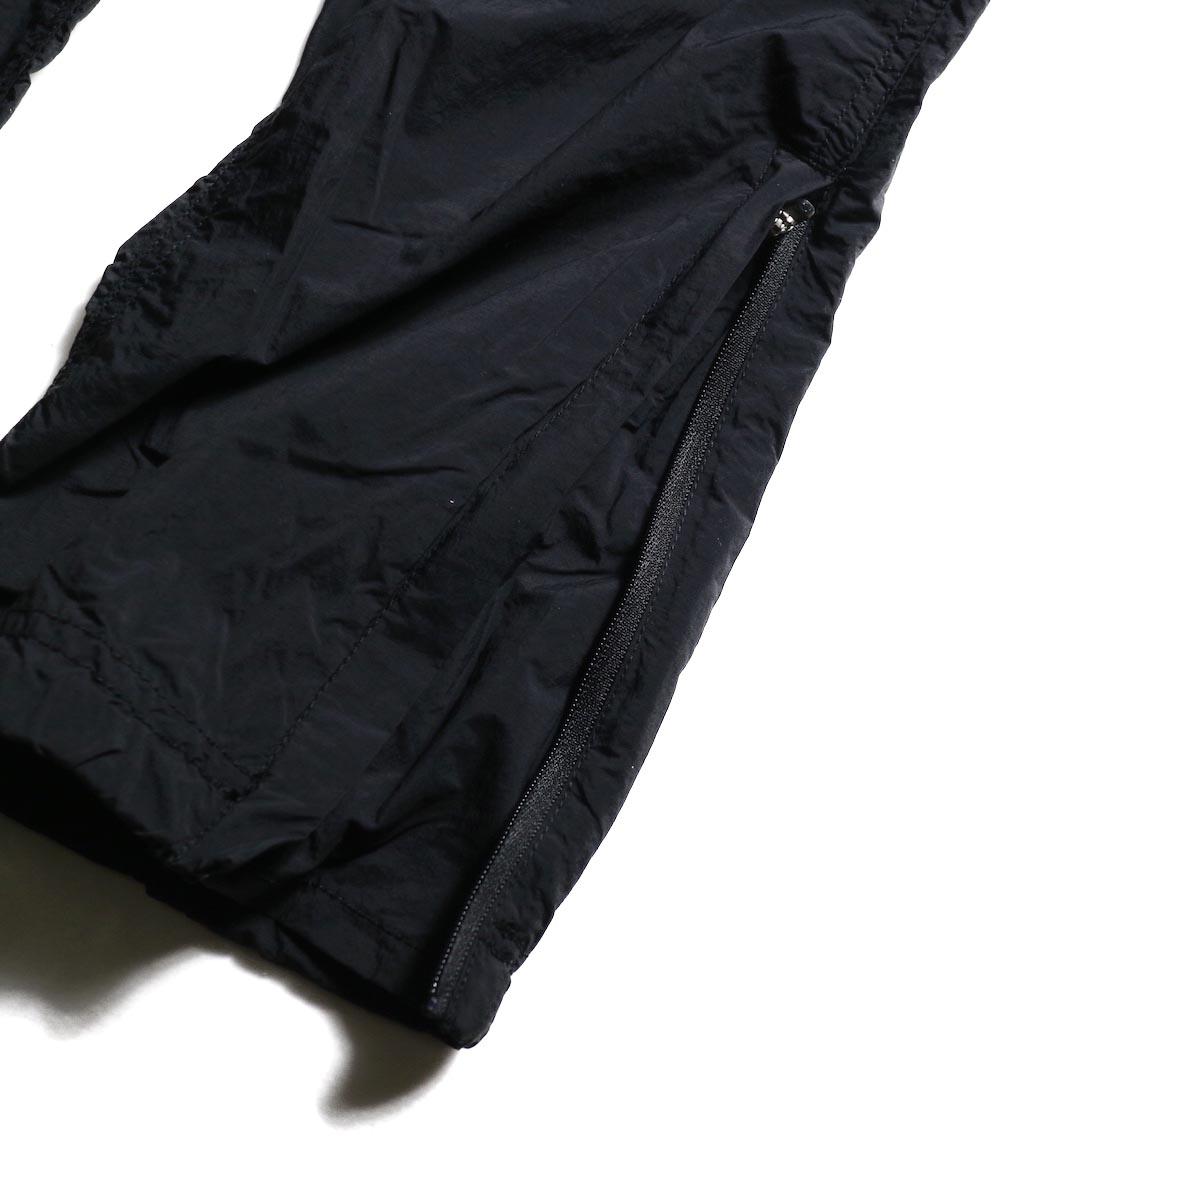 GRAMICCI / Packable Truck Pants (Black) 裾ジップ